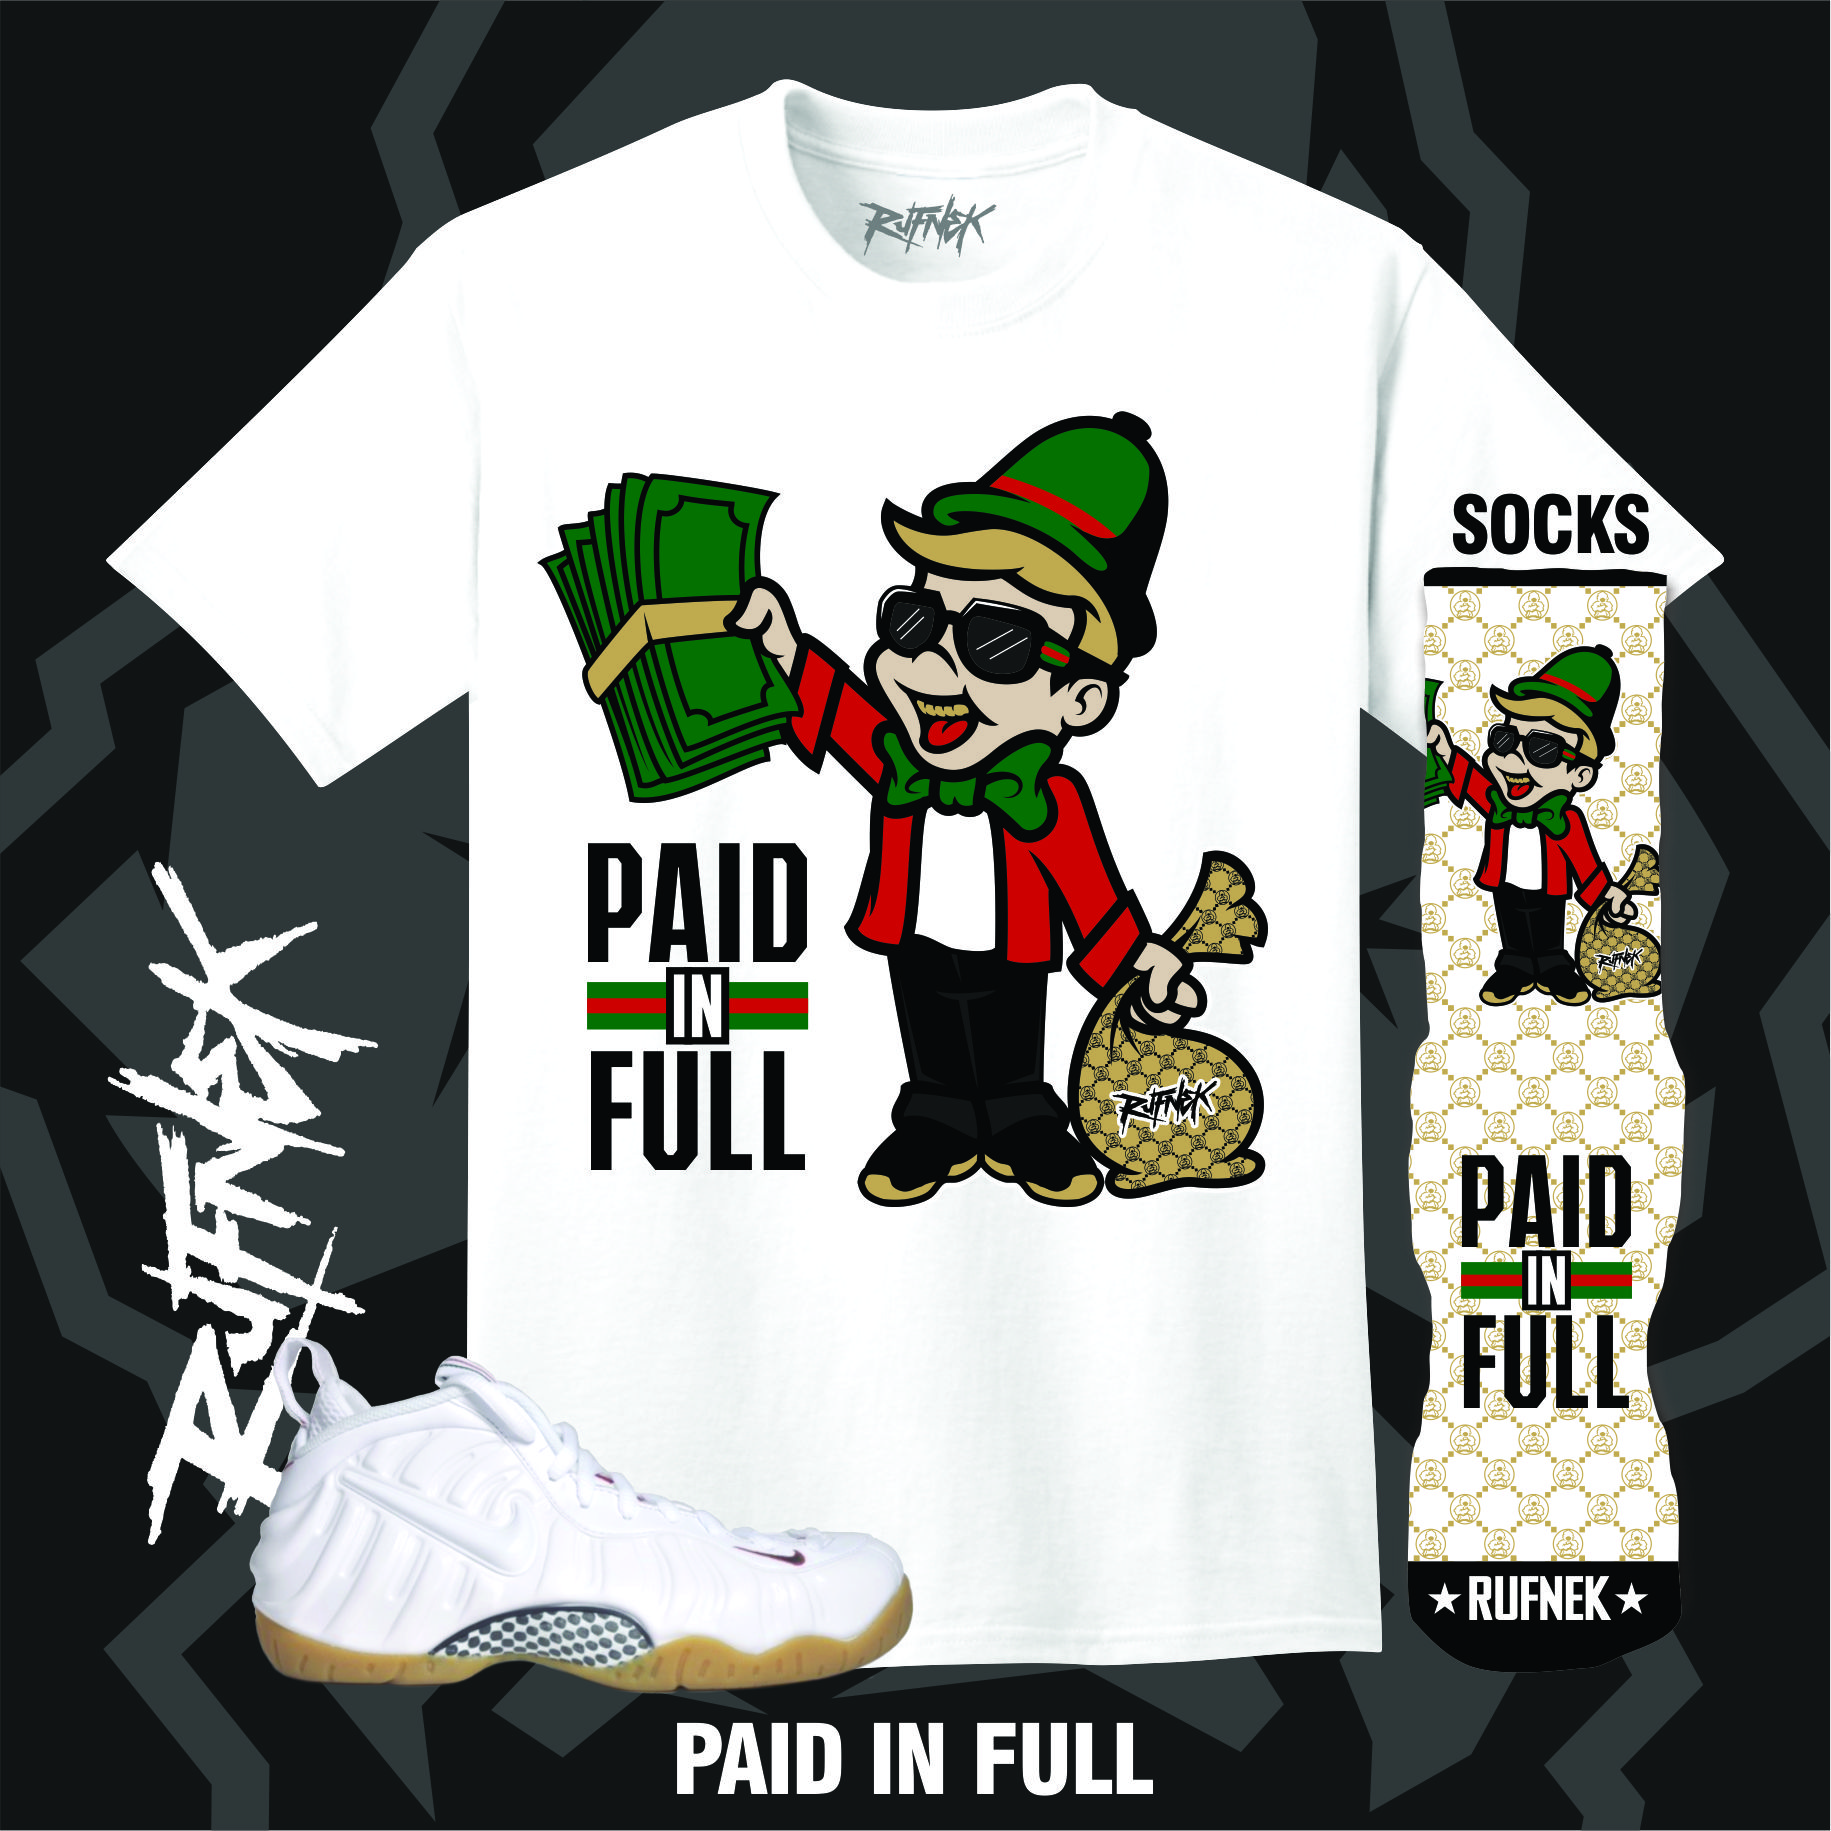 44dab13dc White Gucci Foamposites Sneaker Outfits – X Gear 101 Blog : Sneaker ...